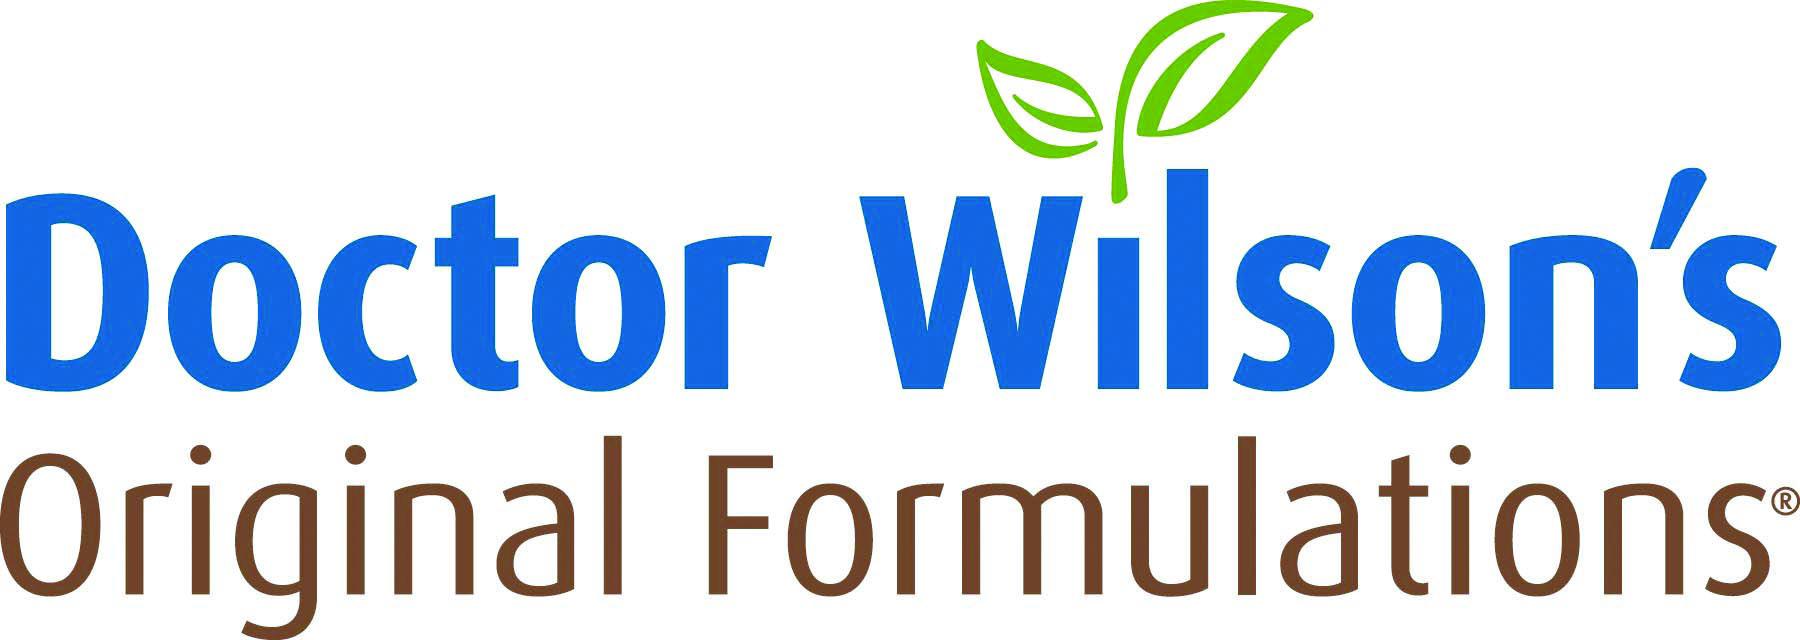 Doctor Wilson's Original Formulations logo